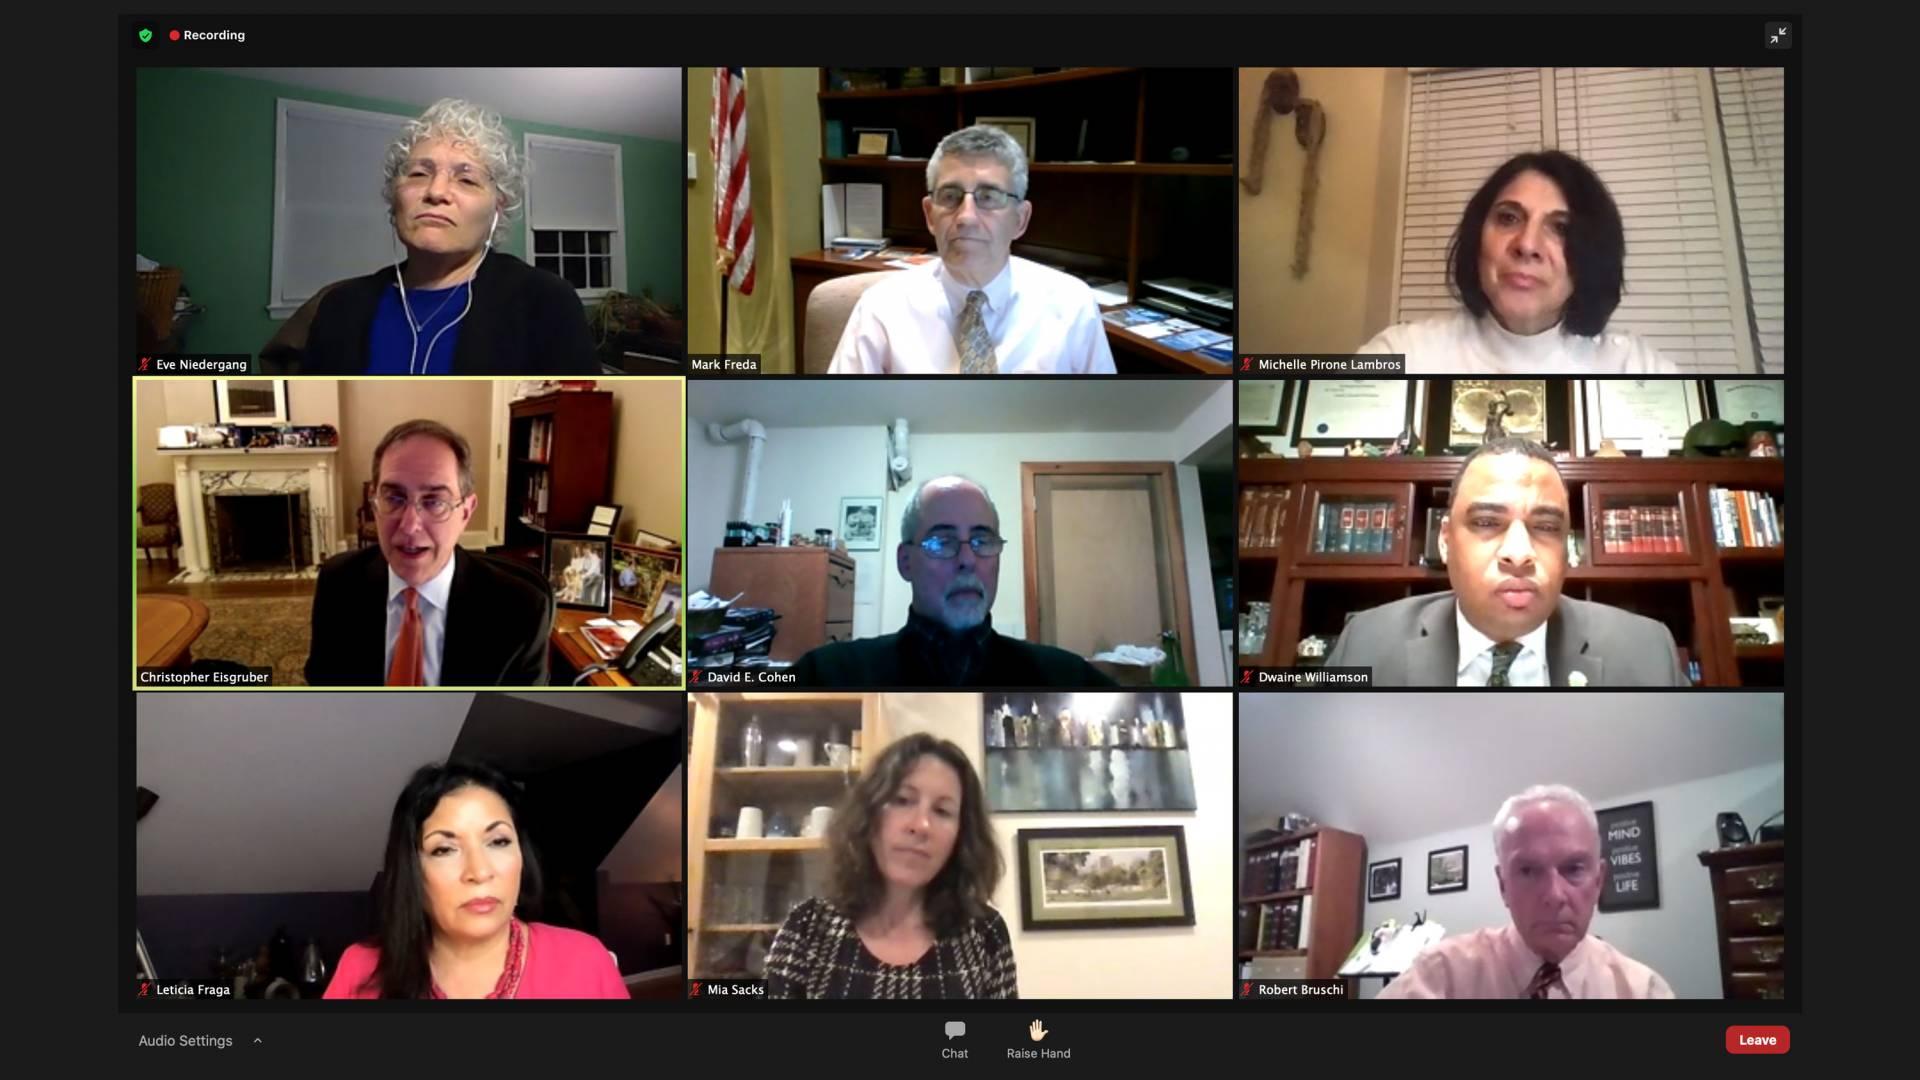 screenshot of attendees at Princeton Town Meeting